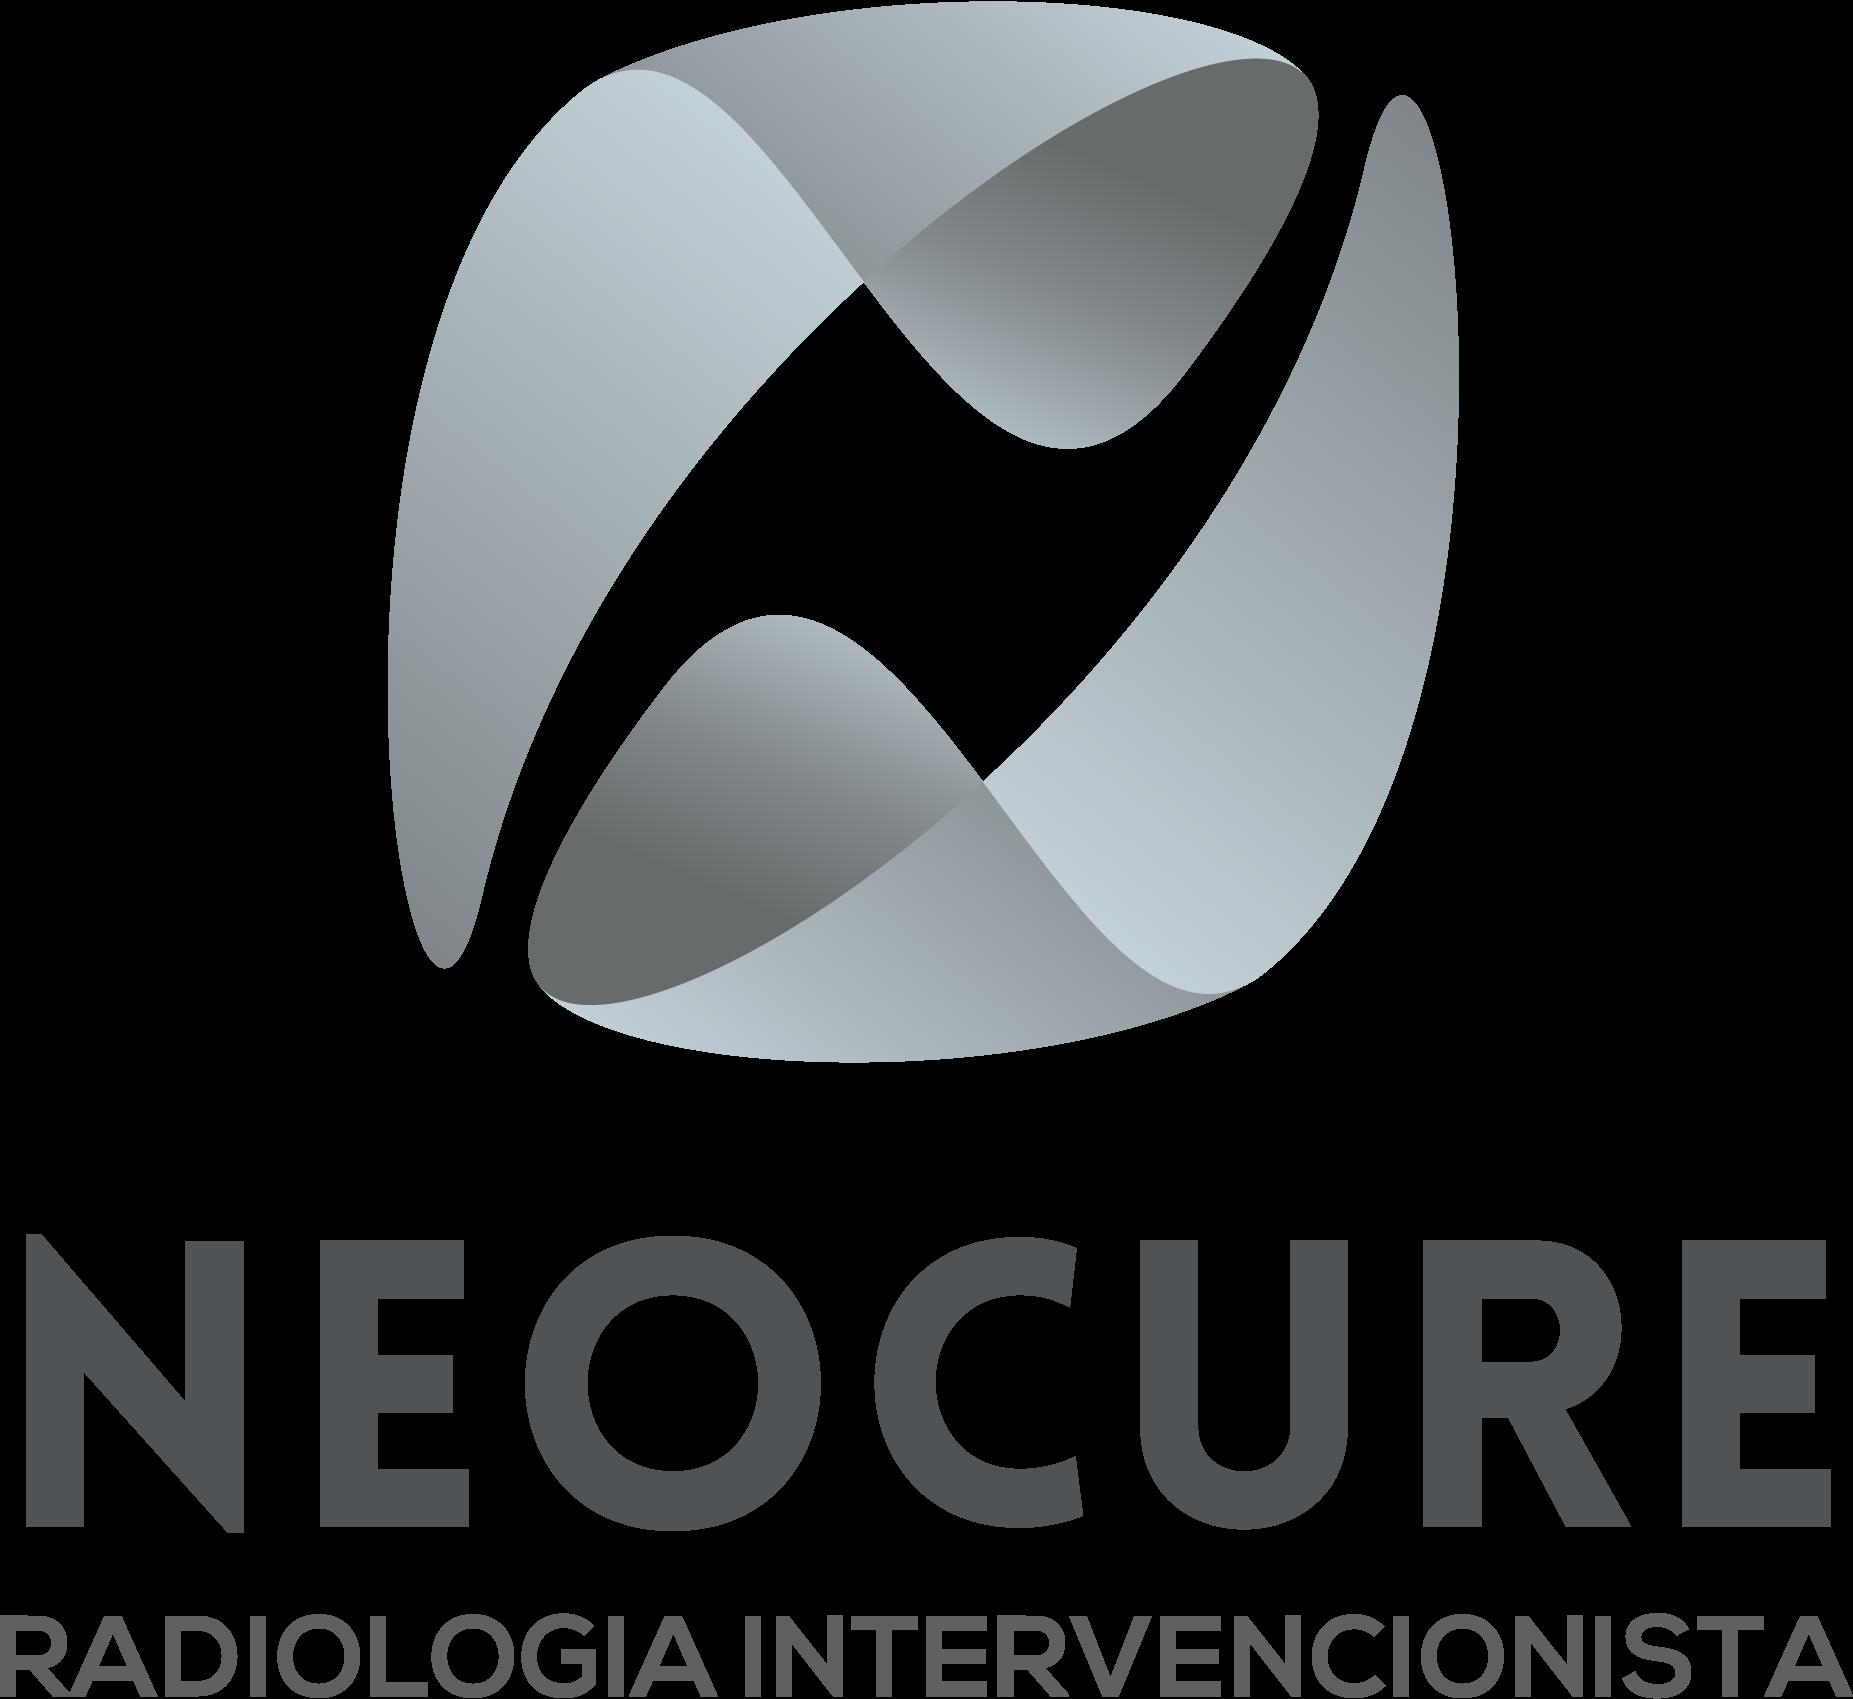 Radiologia Intervencionista